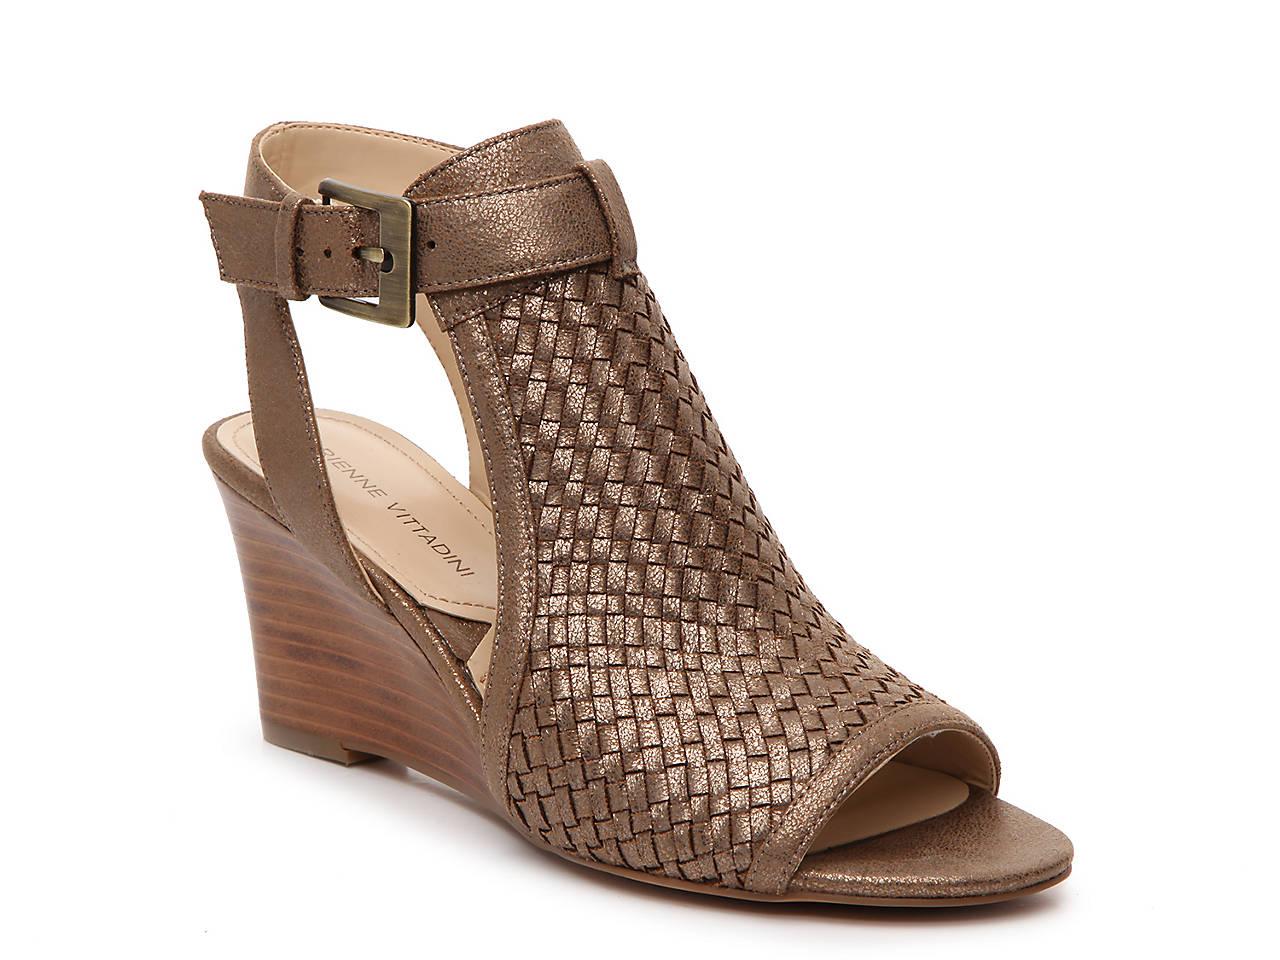 e8b0e109e58 Adrienne Vittadini Roseanne Wedge Sandal Women s Shoes